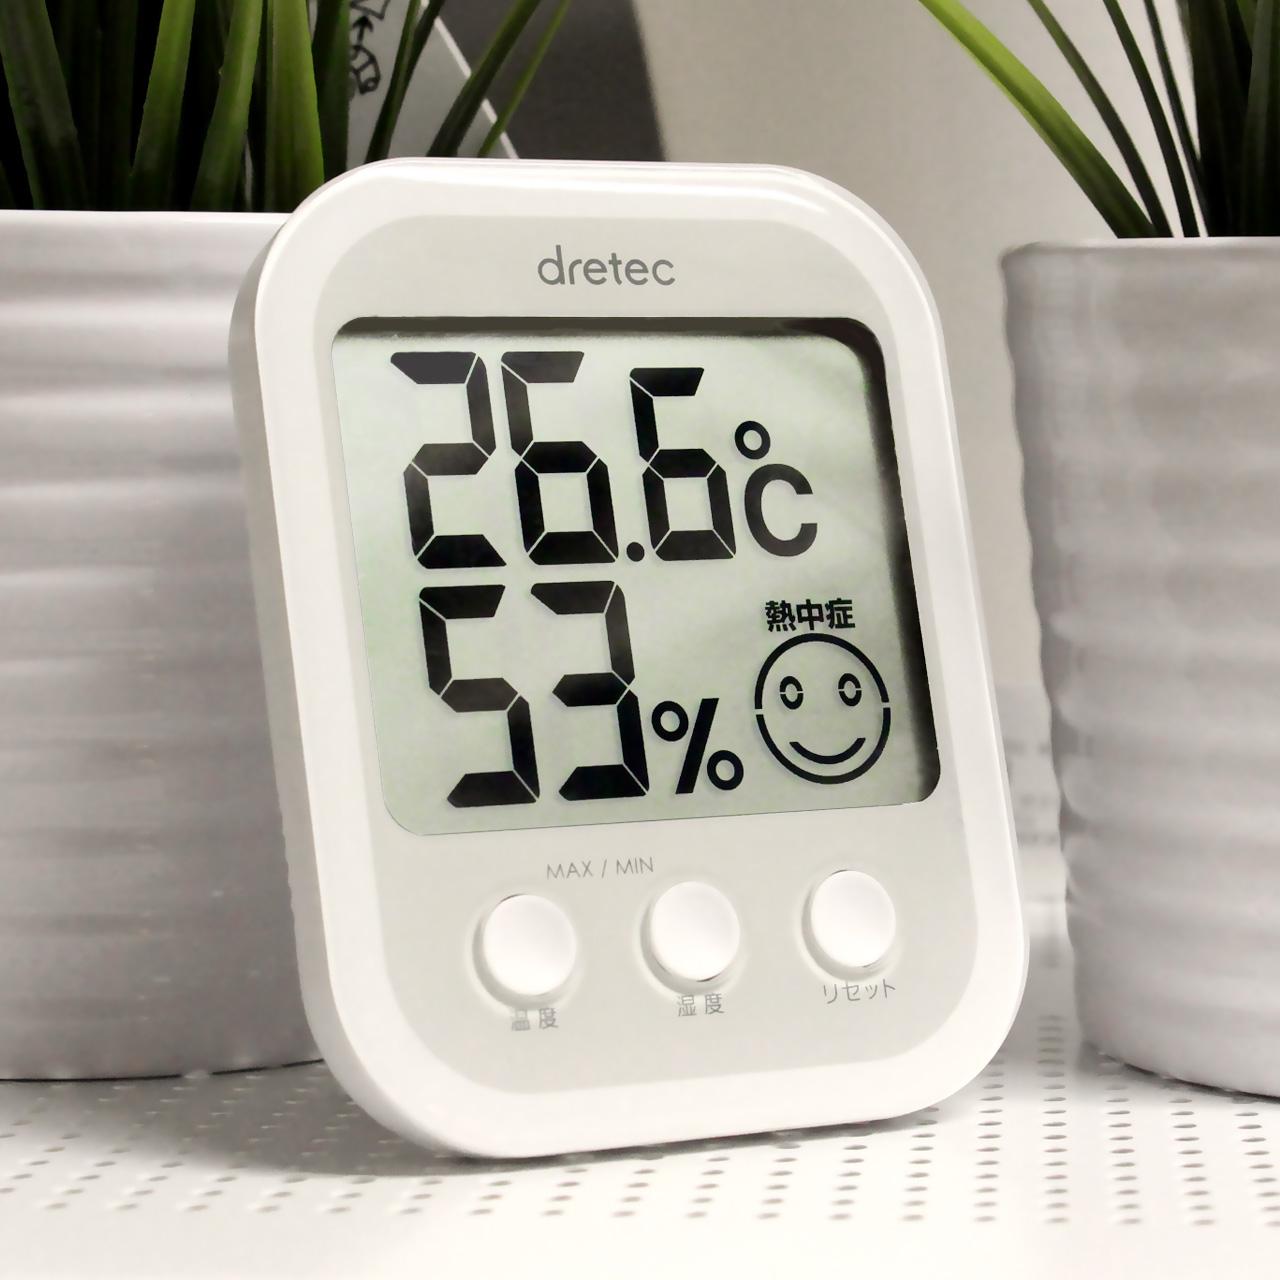 dretec多利科温湿度计婴儿房日本 家用温度计室